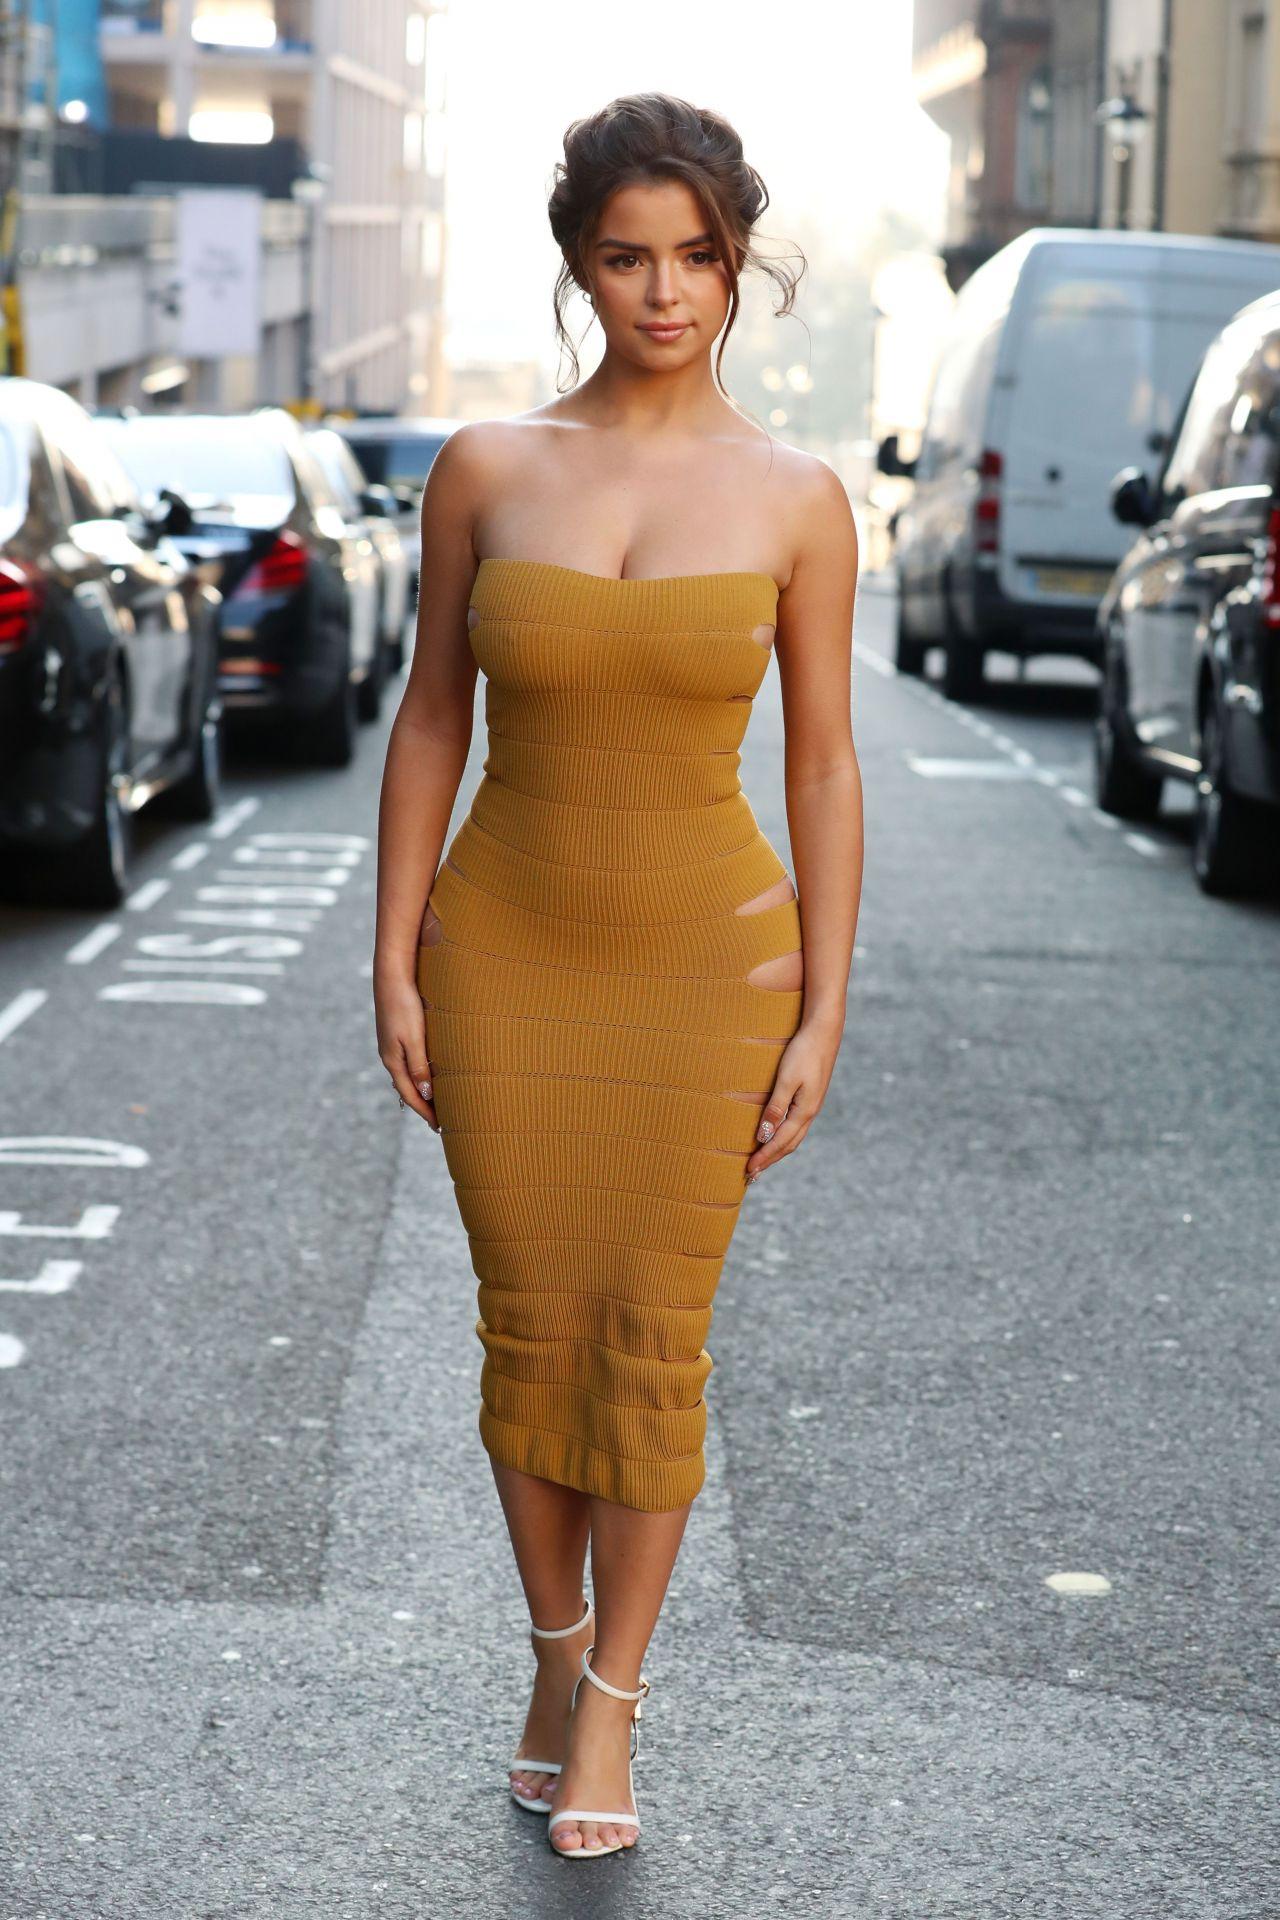 Demi Rose In Skin Tight Mustard Dress 02 15 2019